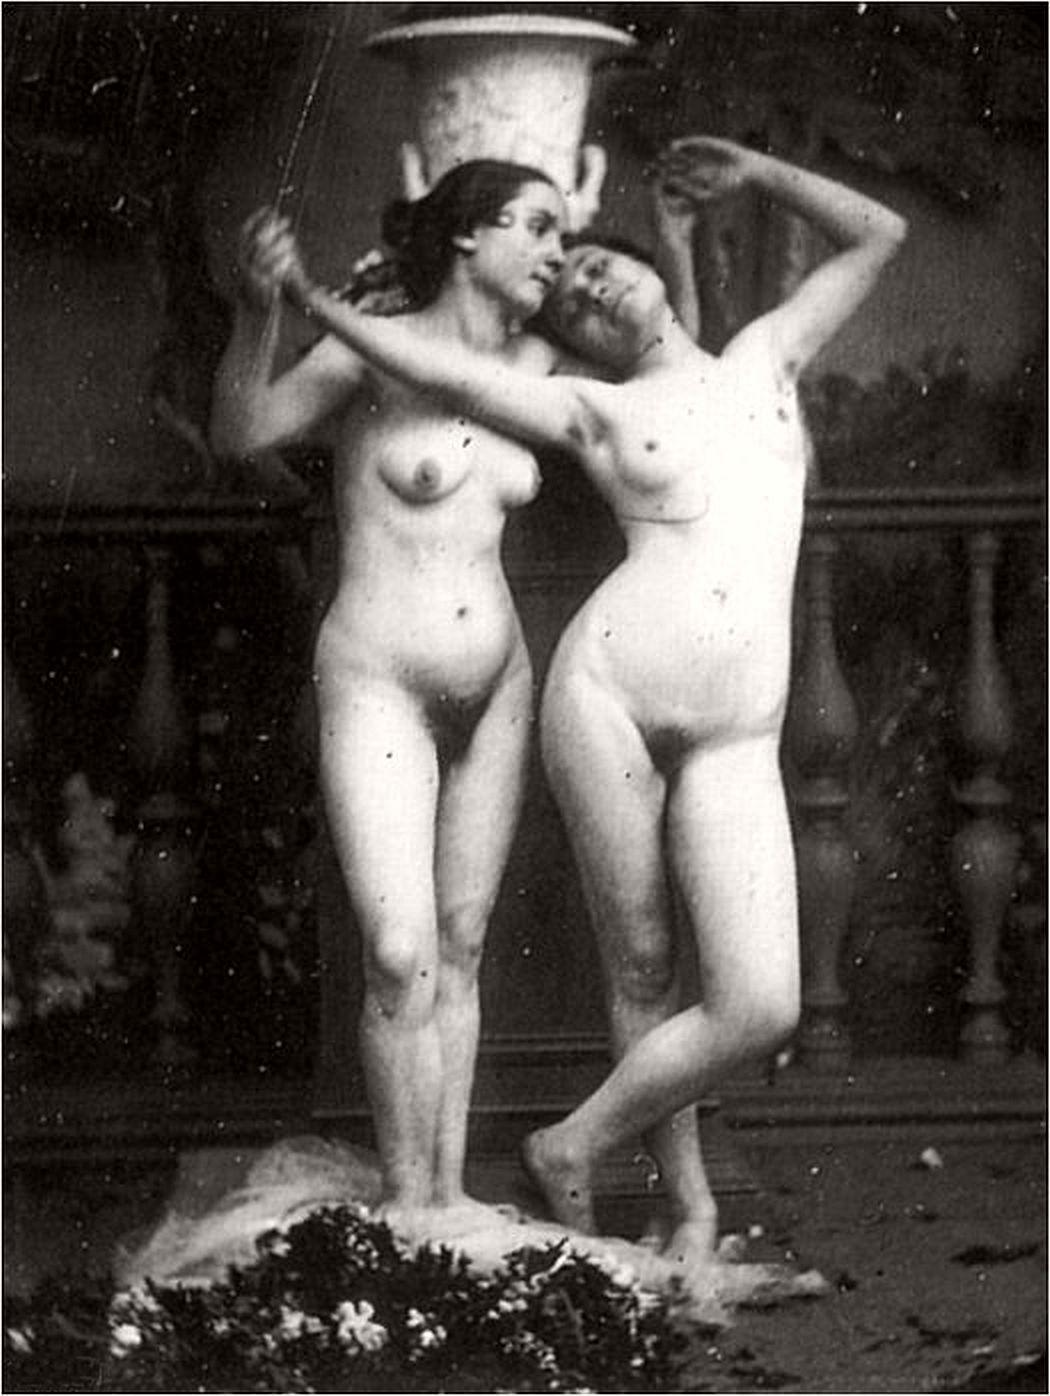 vintage-ninetenth-century-lesbian-women-nudes-1880s-11